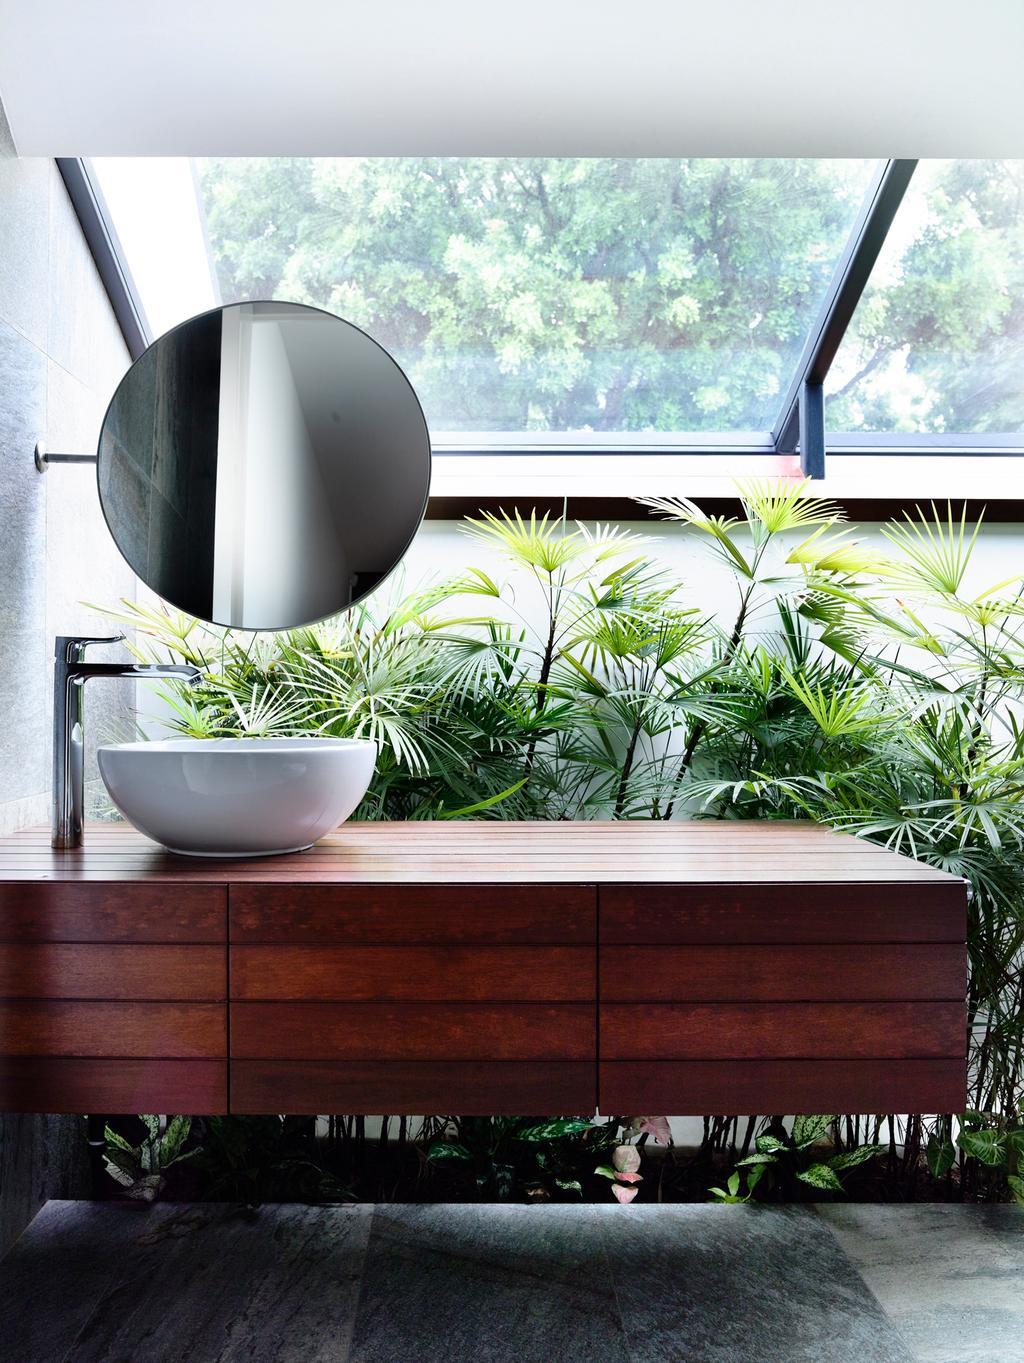 Modern, Landed, Bathroom, Greenwood Avenue, Architect, HYLA Architects, Flora, Herbs, Jar, Plant, Planter, Potted Plant, Pottery, Vase, Arecaceae, Palm Tree, Tree, Pot